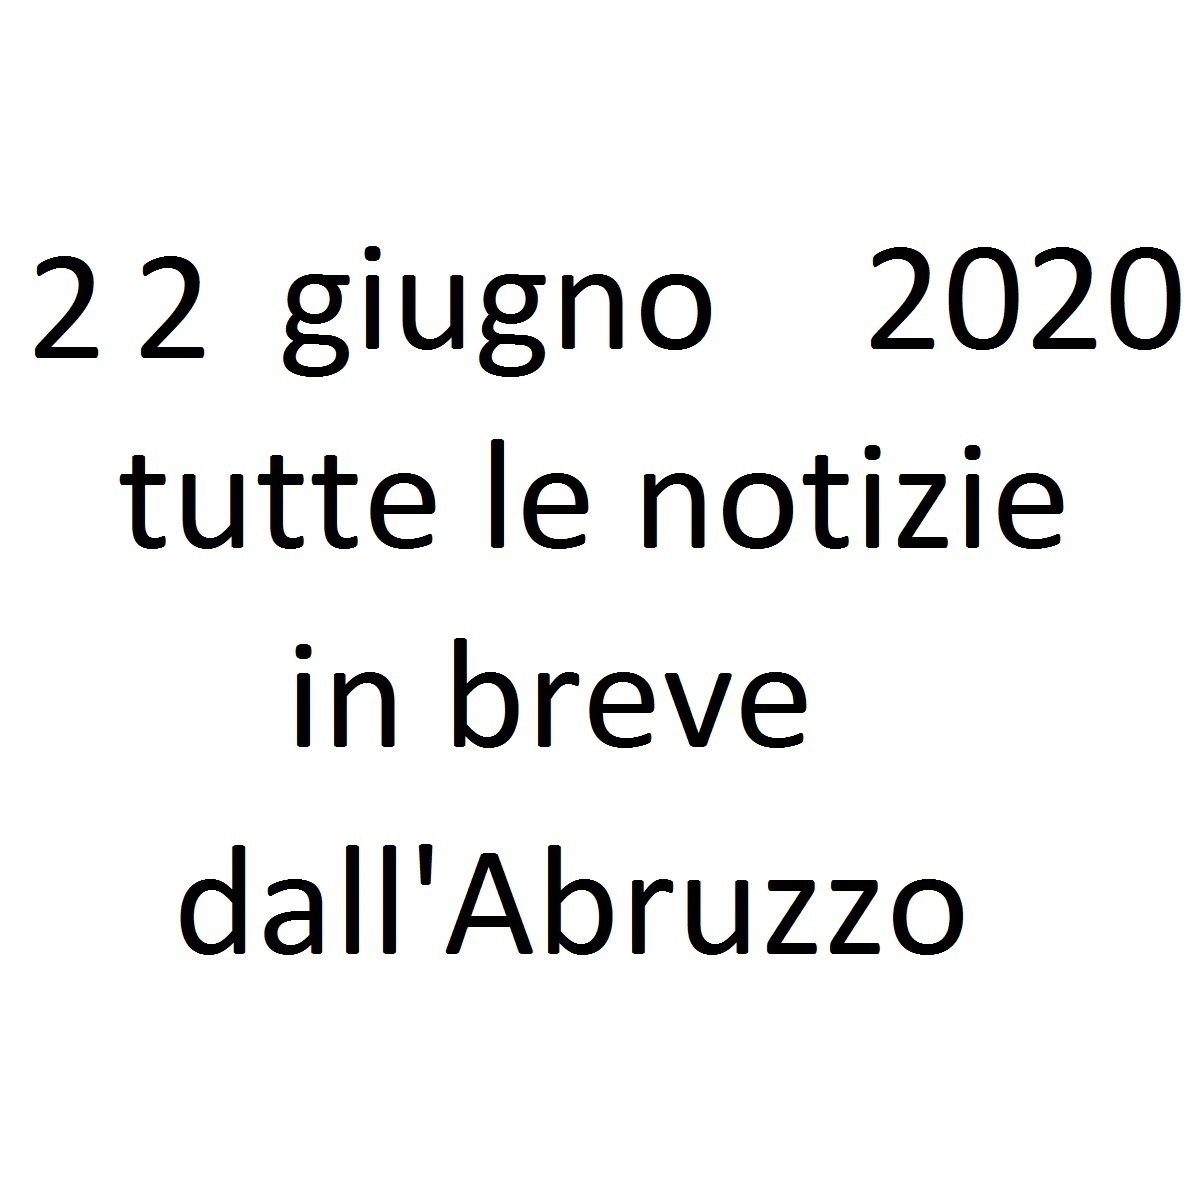 22 giugno 2020 notizie in breve foto